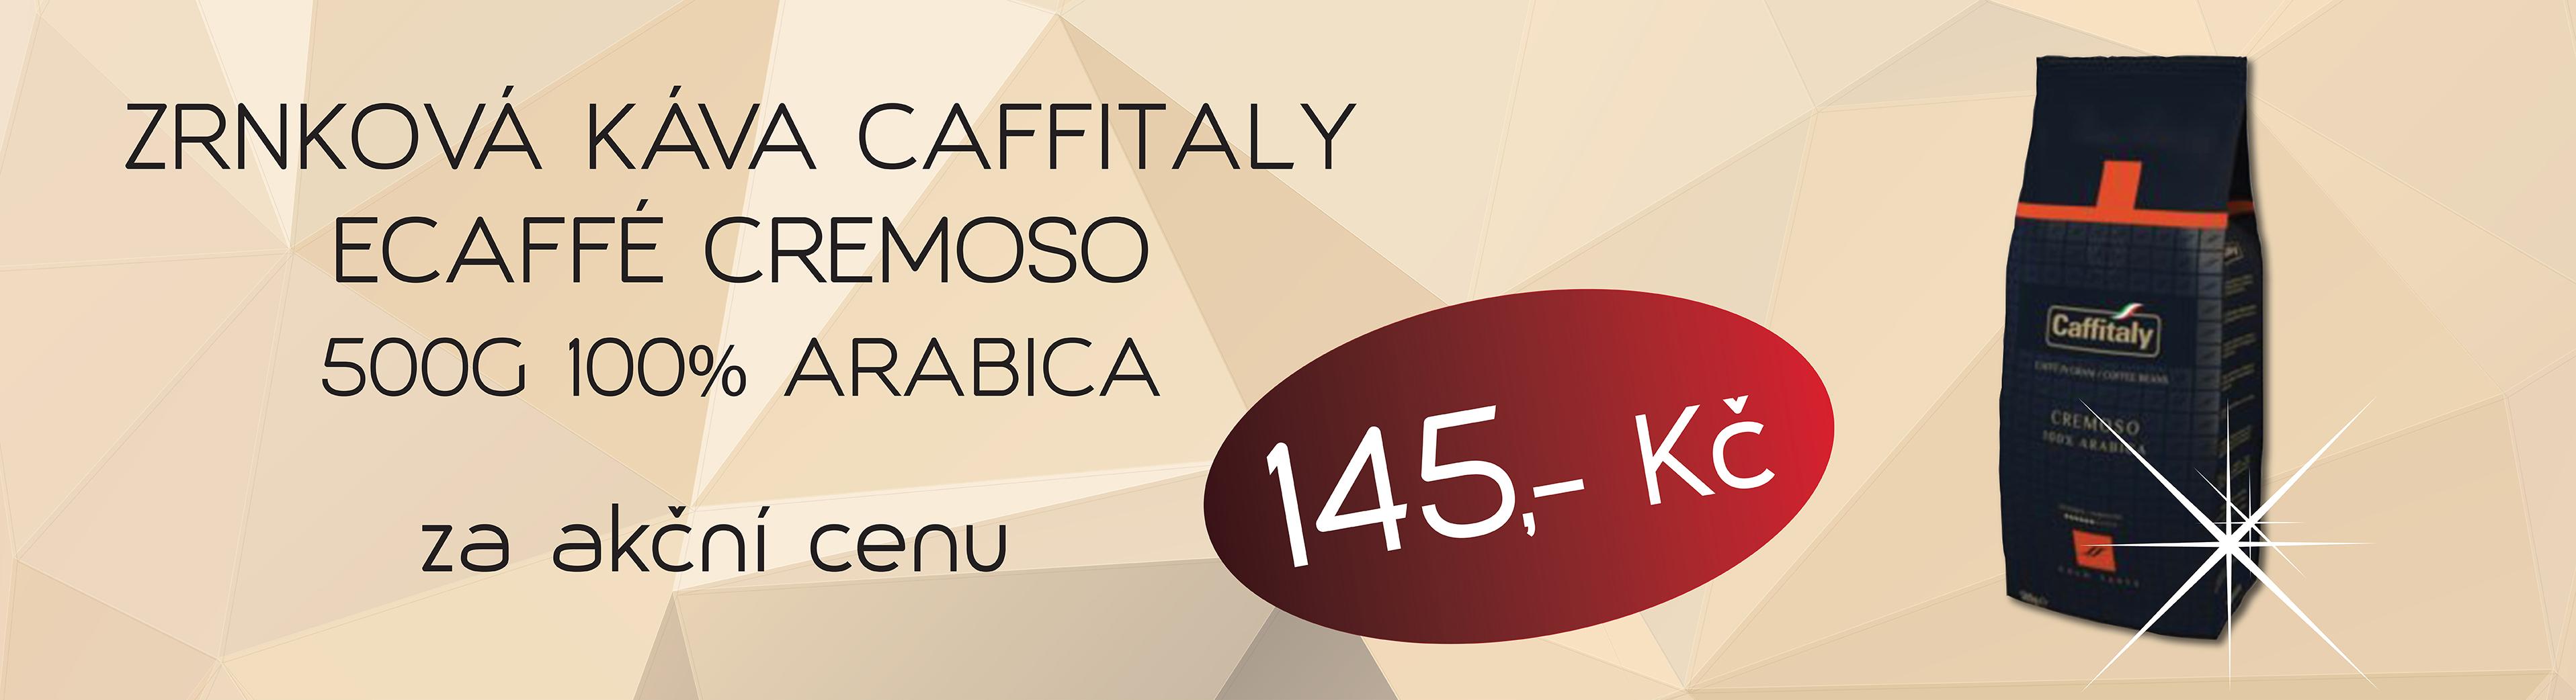 Caffitaly Cremoso 500g akční ponuka